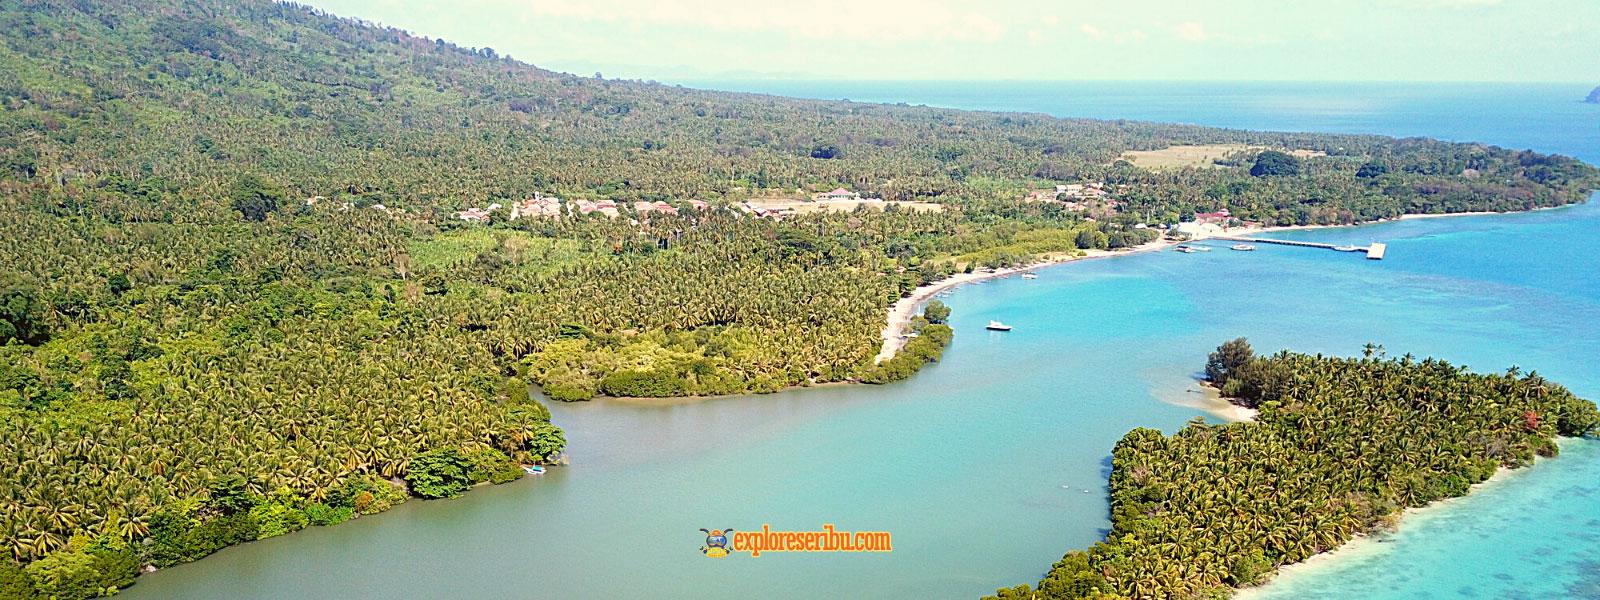 paket private wisata pulau sebesi dari Jakarta